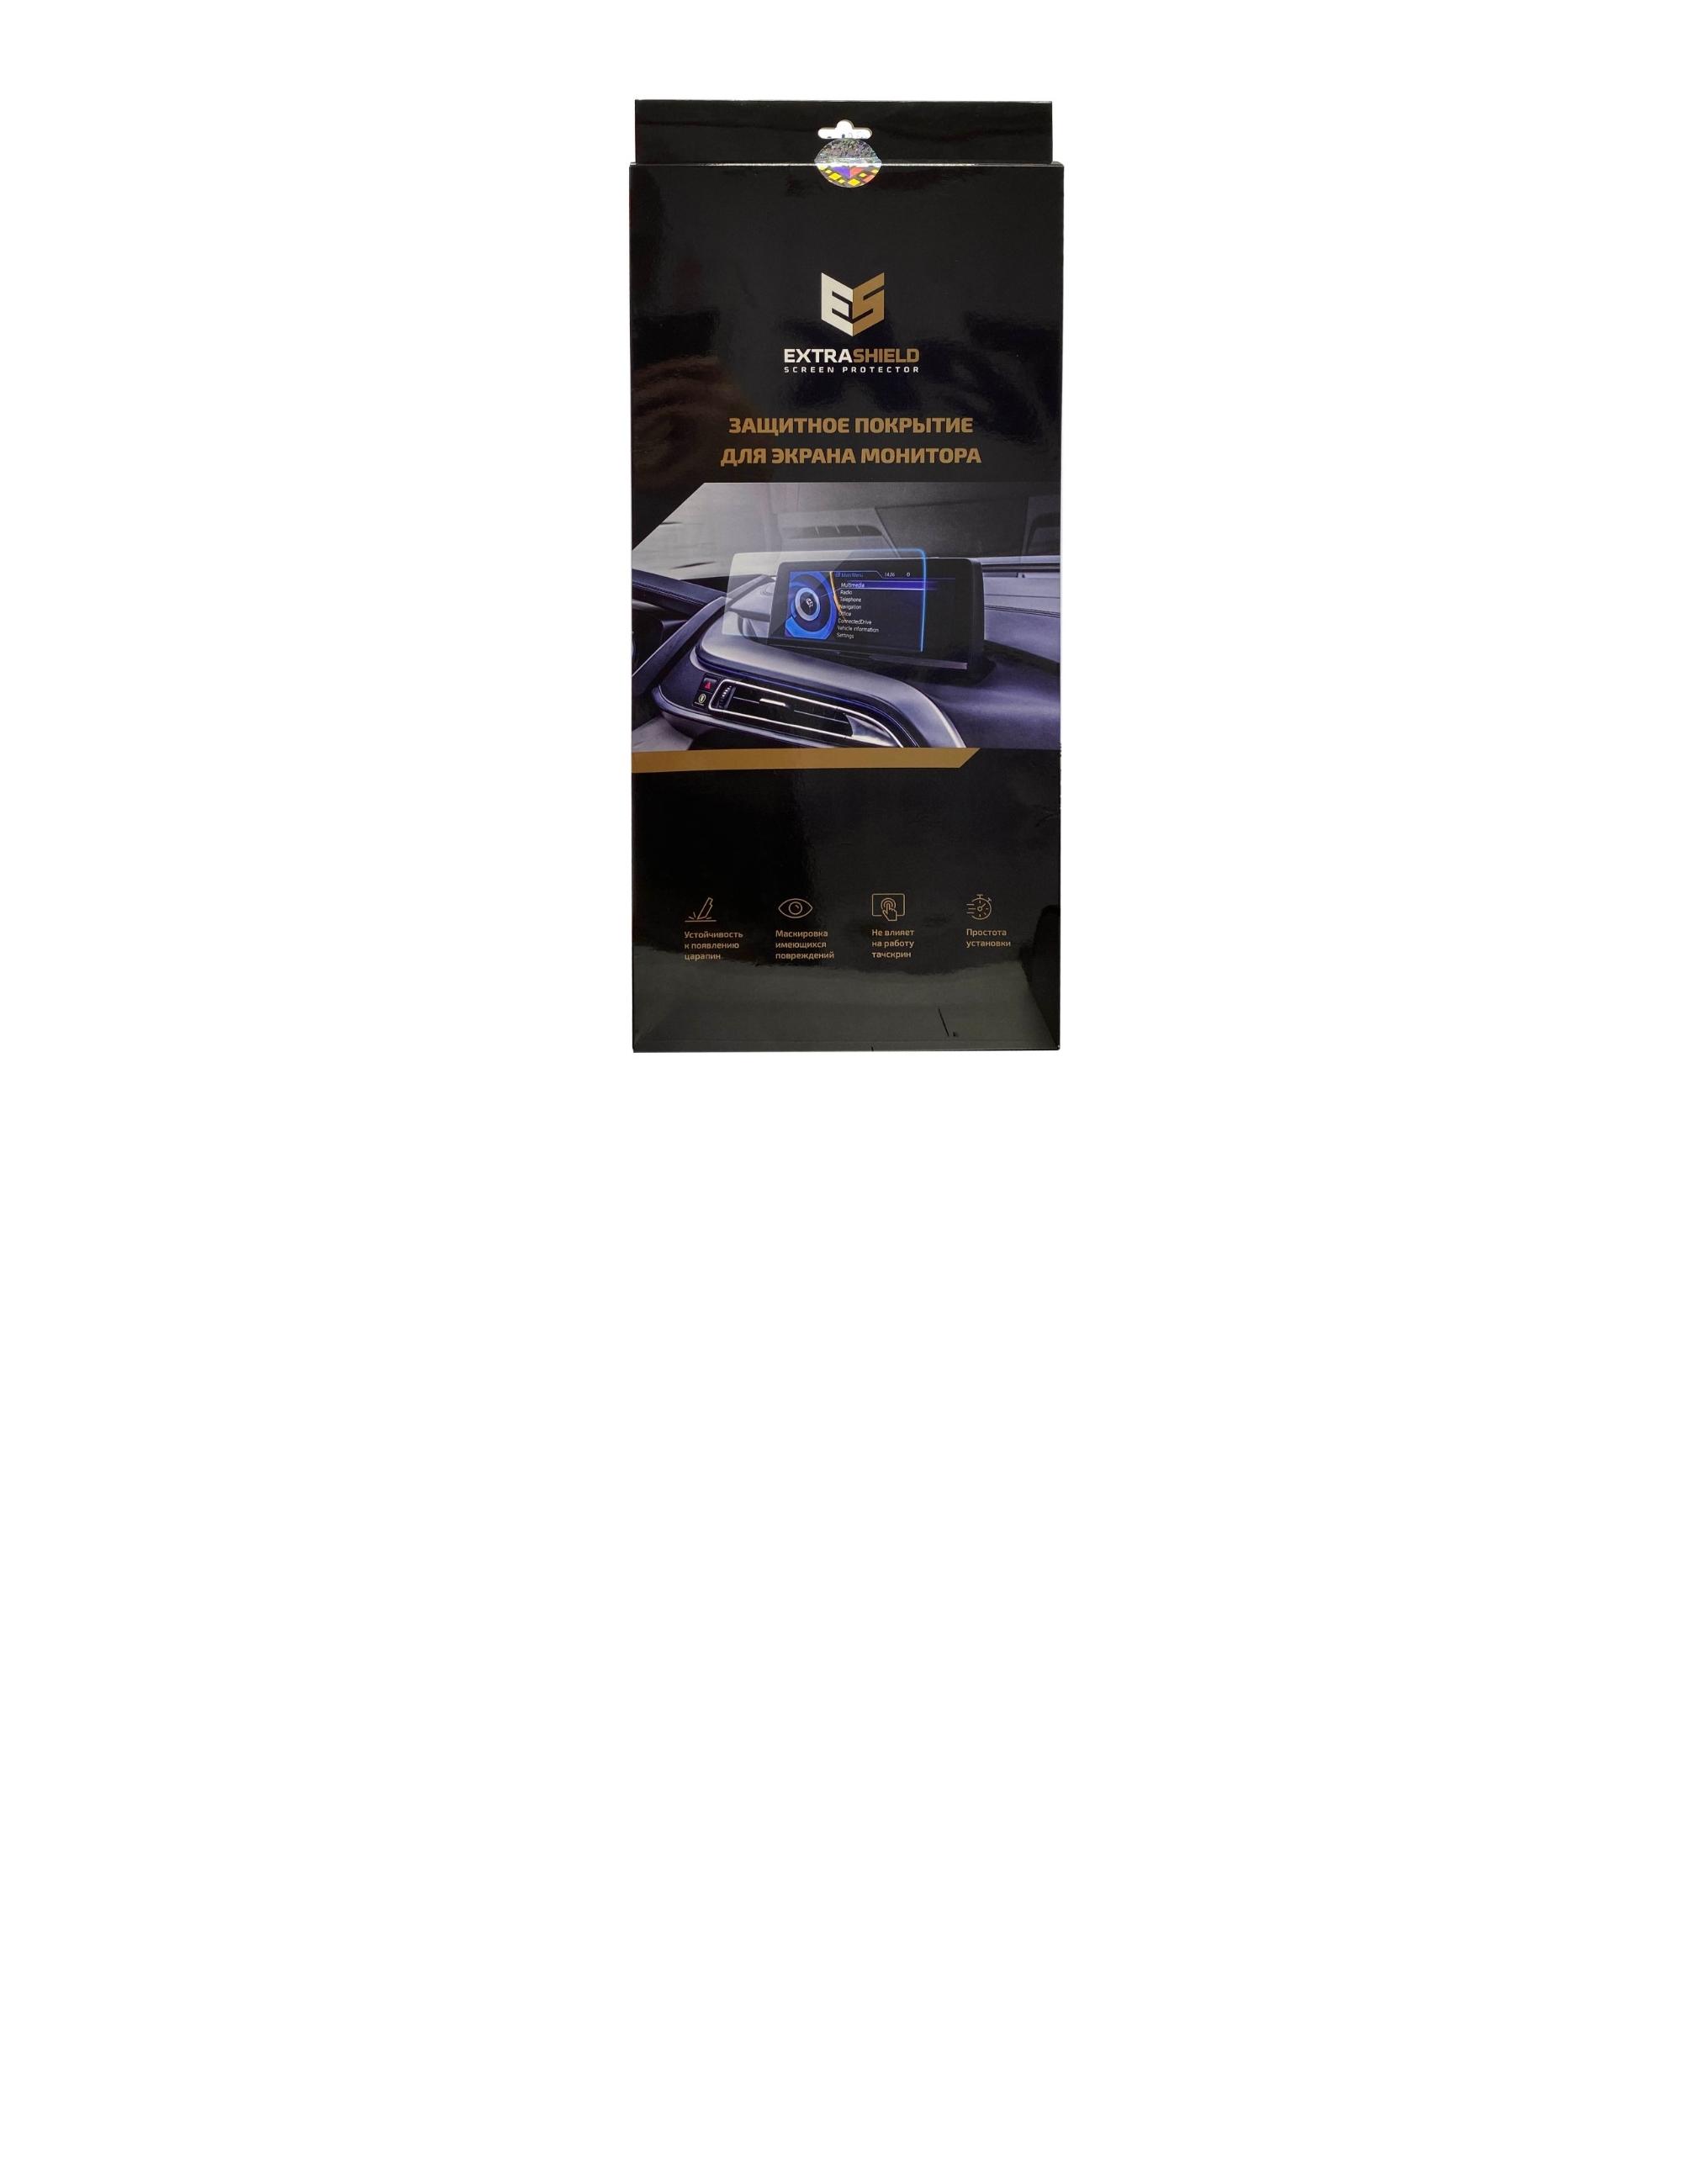 BMW Х6 (F16) 2014-2018 мультимедиа 10.25 Защитное стекло Глянец